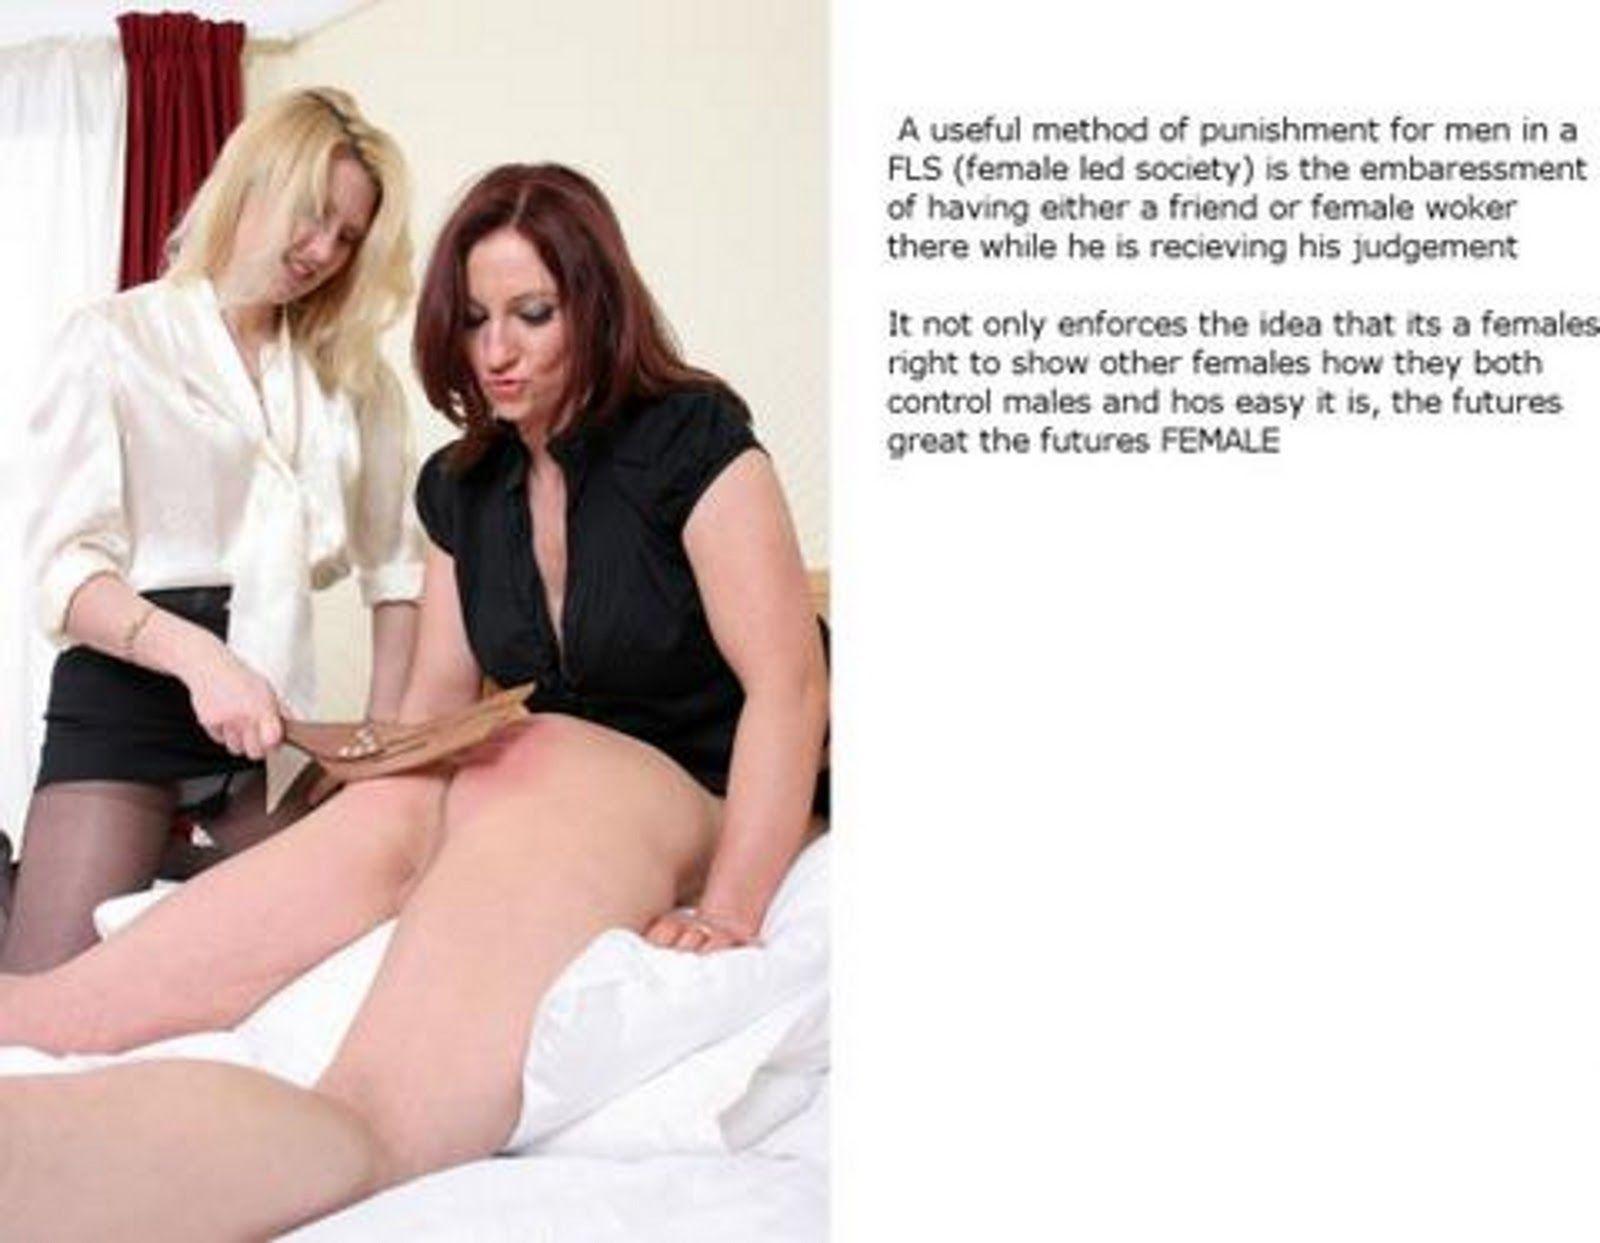 Adult femdom non fiction seems